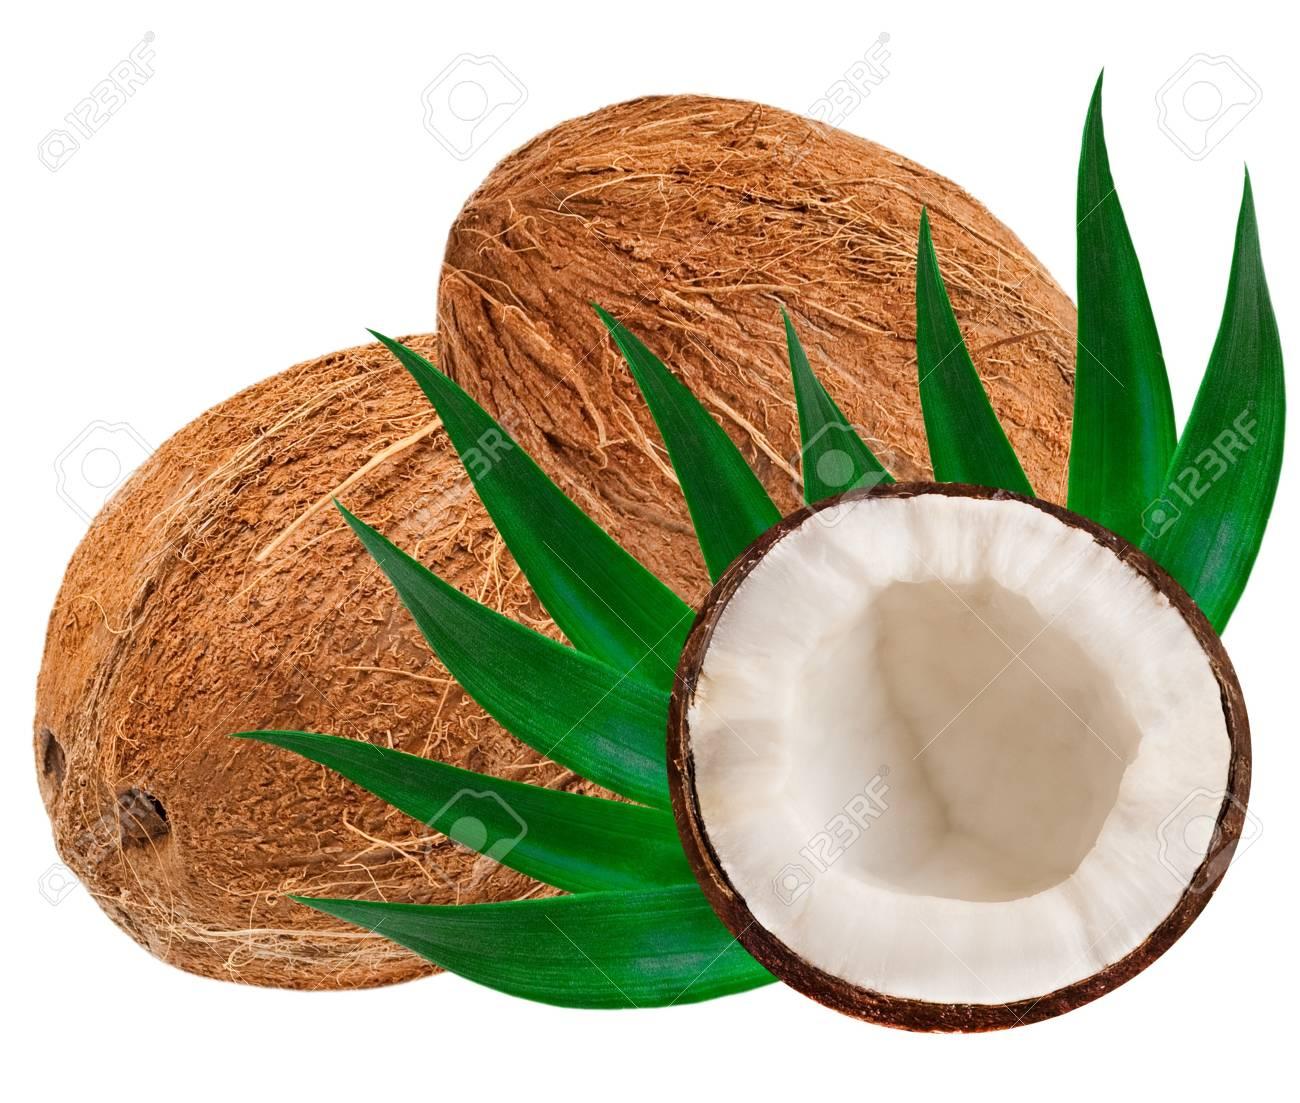 coconut isolated on white background Stock Photo - 13677164